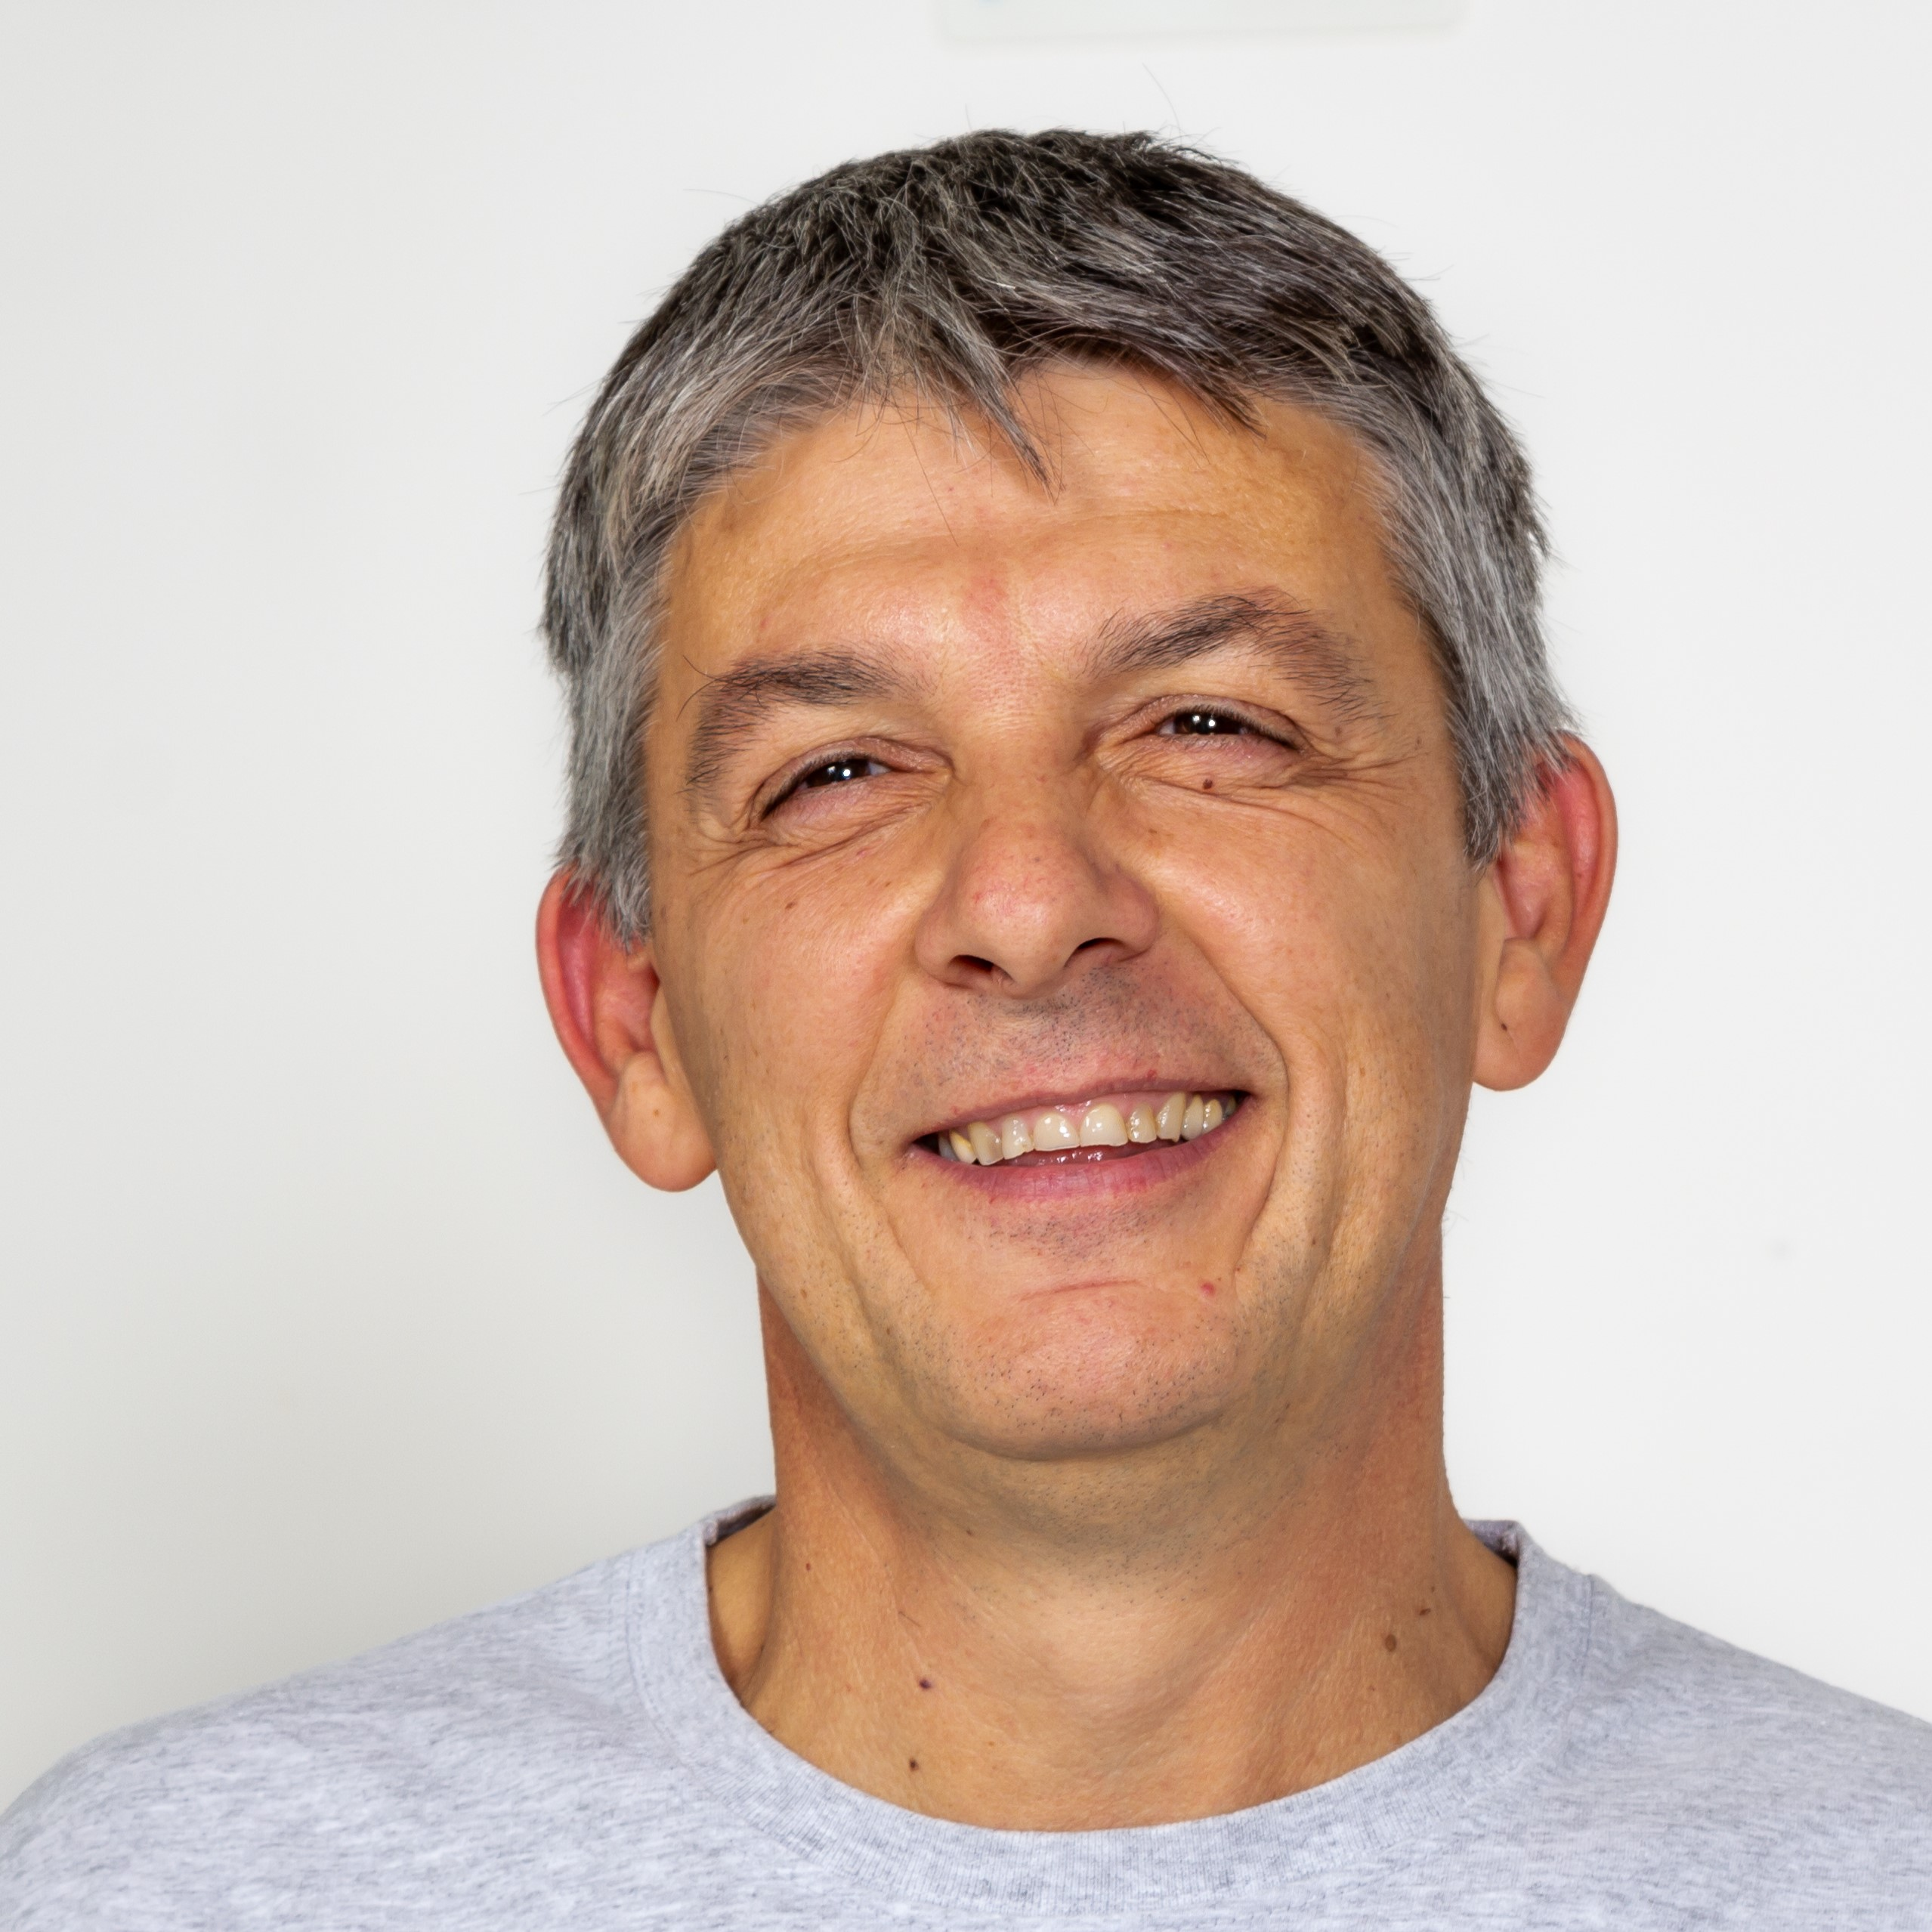 Stefano Polastri